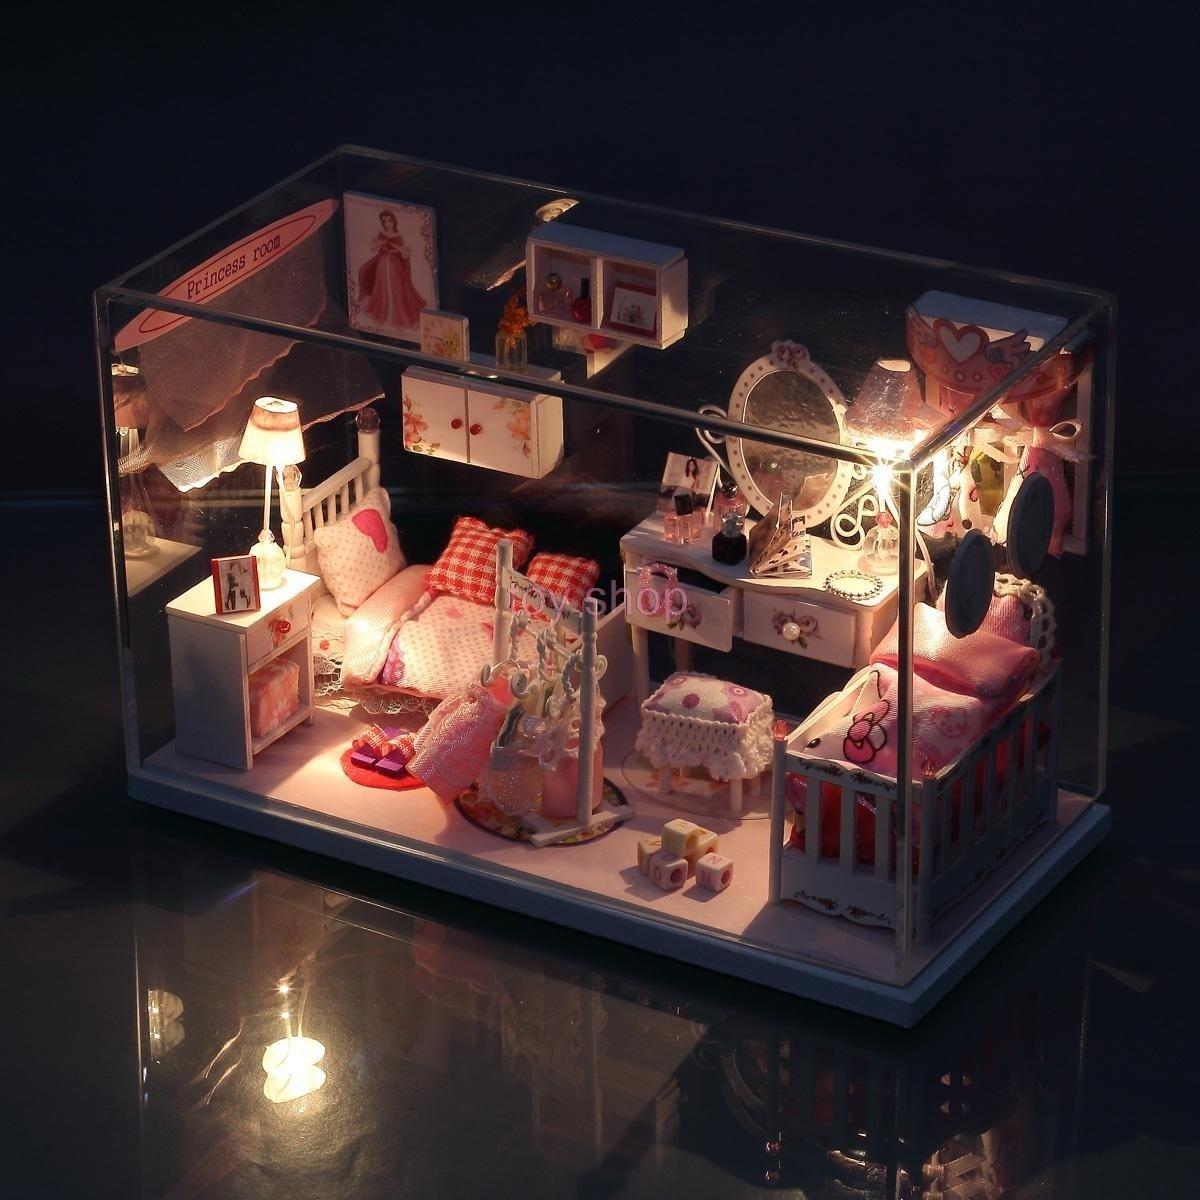 10 Cute Birthday Gift Ideas For Girlfriend birthday gift ideas for girlfriend age 24 lacalabaza 1 2020